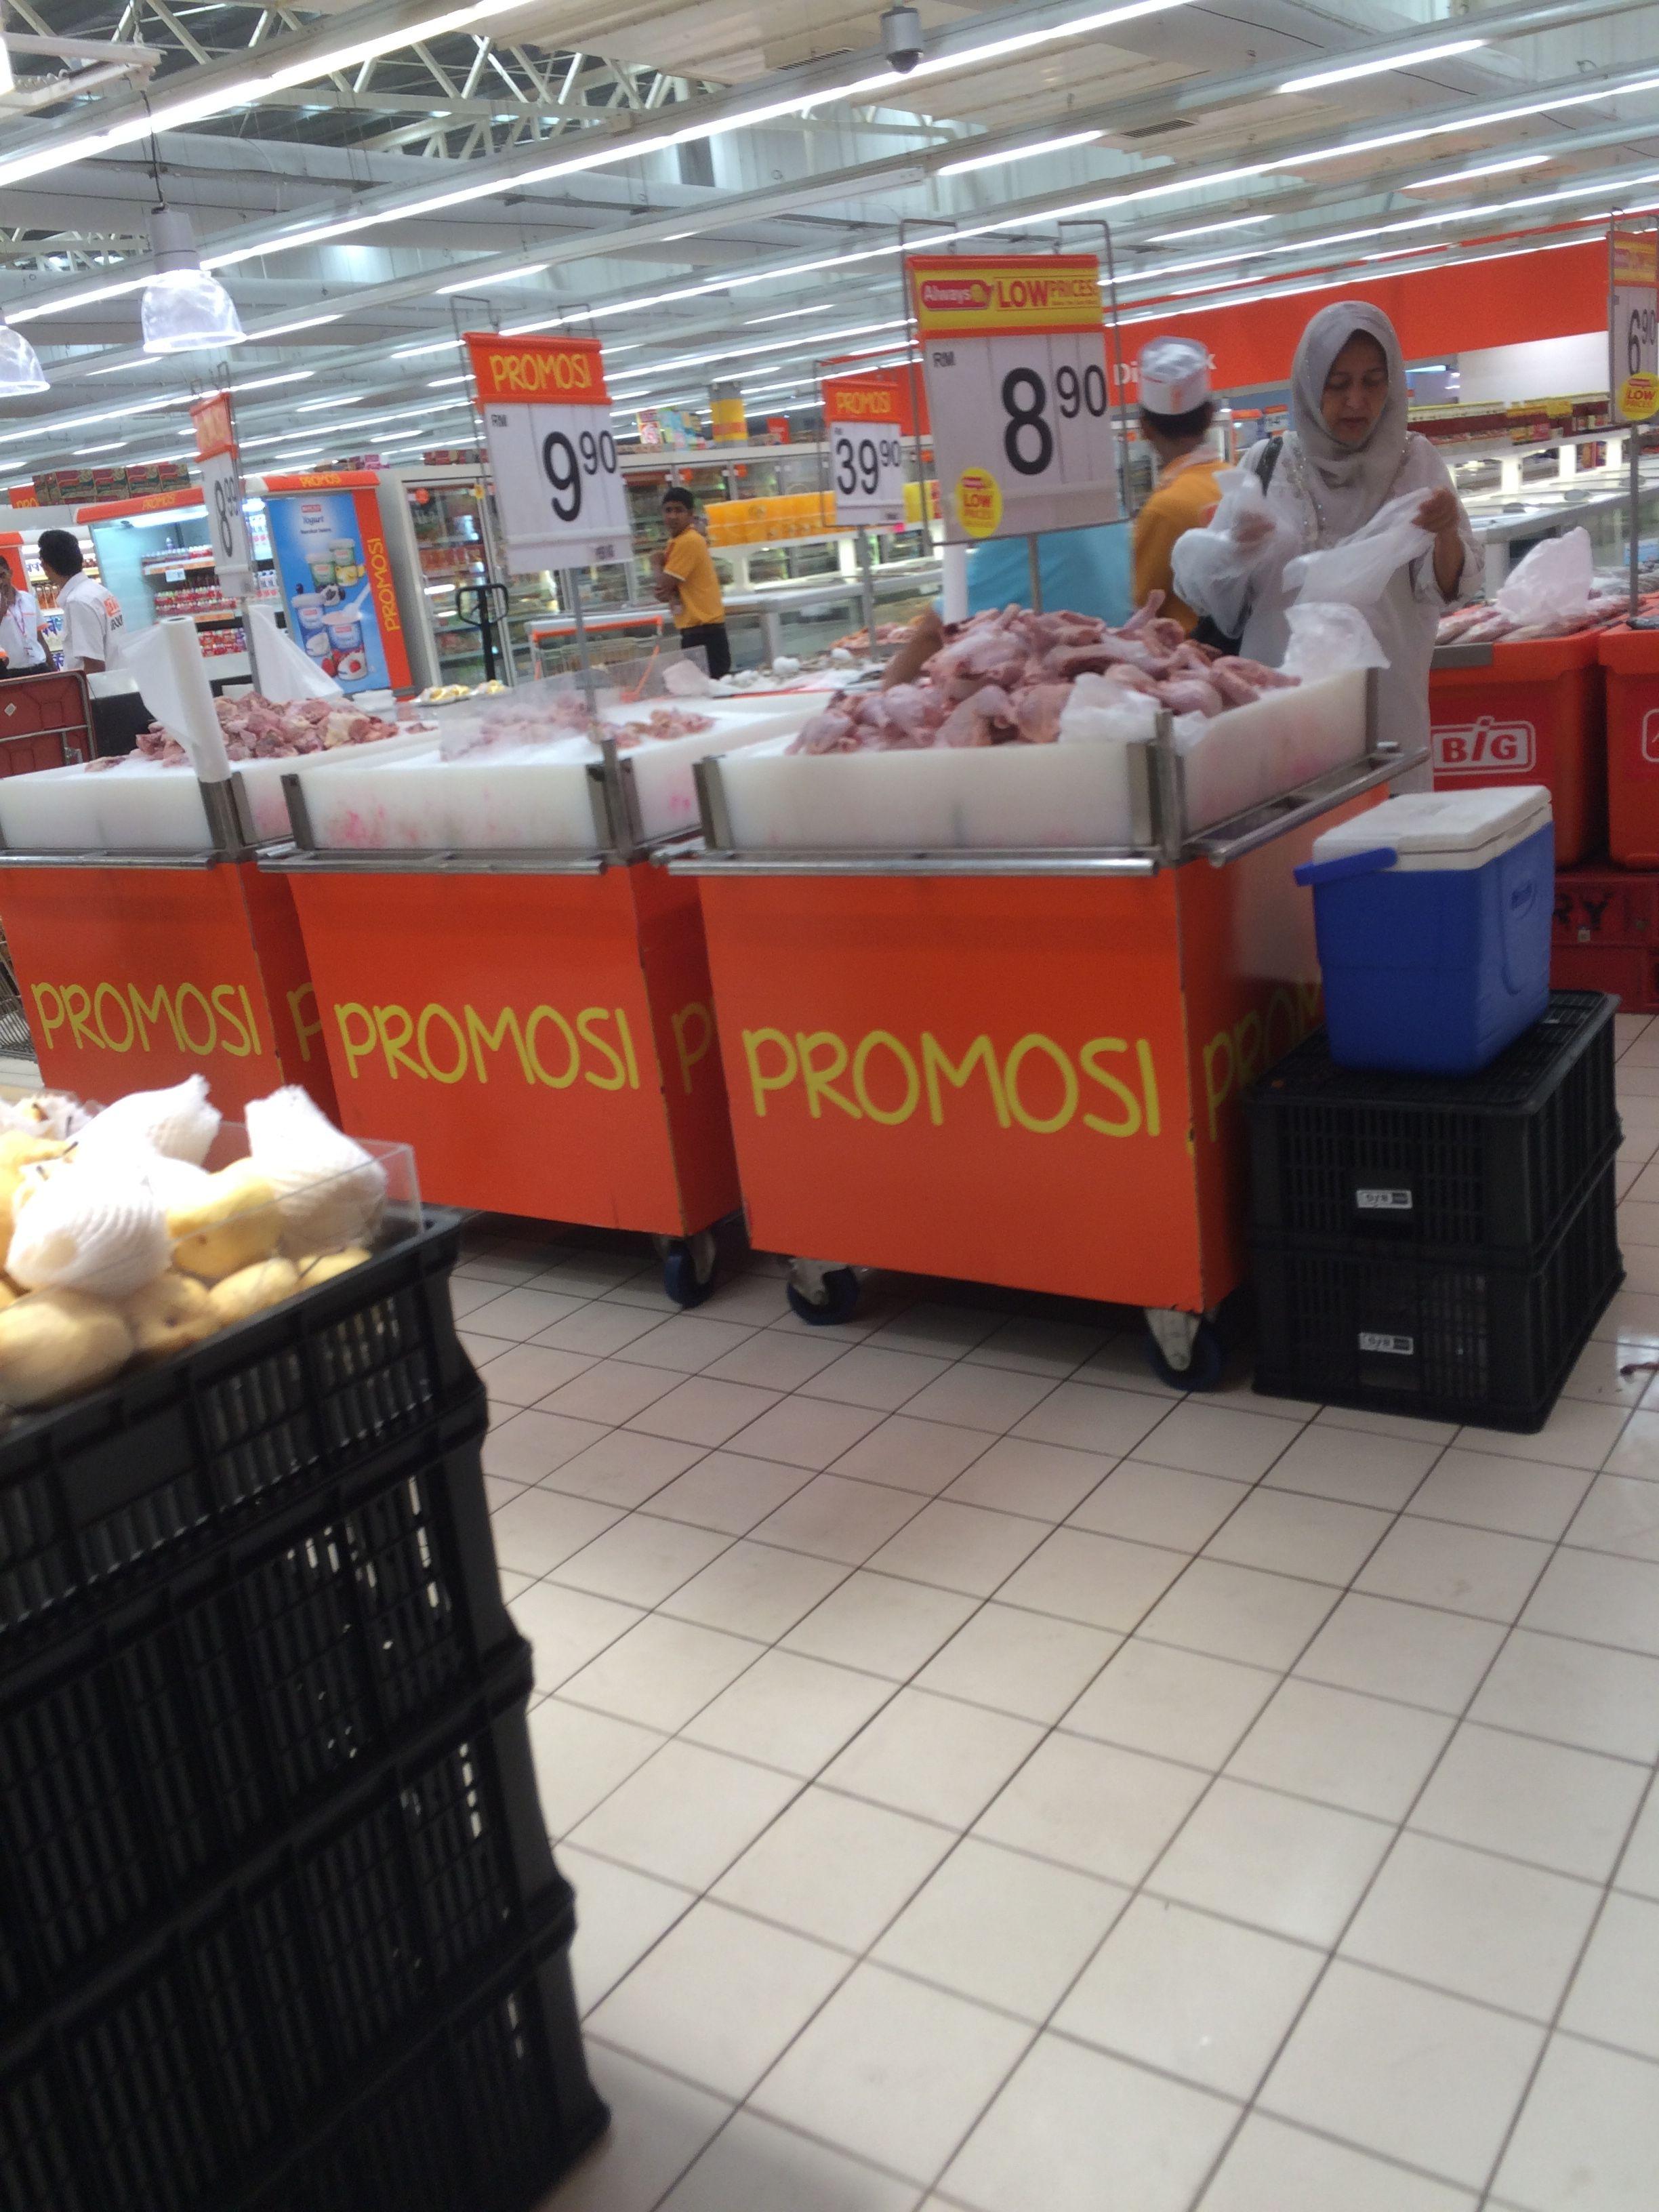 Aeon Big - Johor Bahru Malaysia Hypermarket Layout